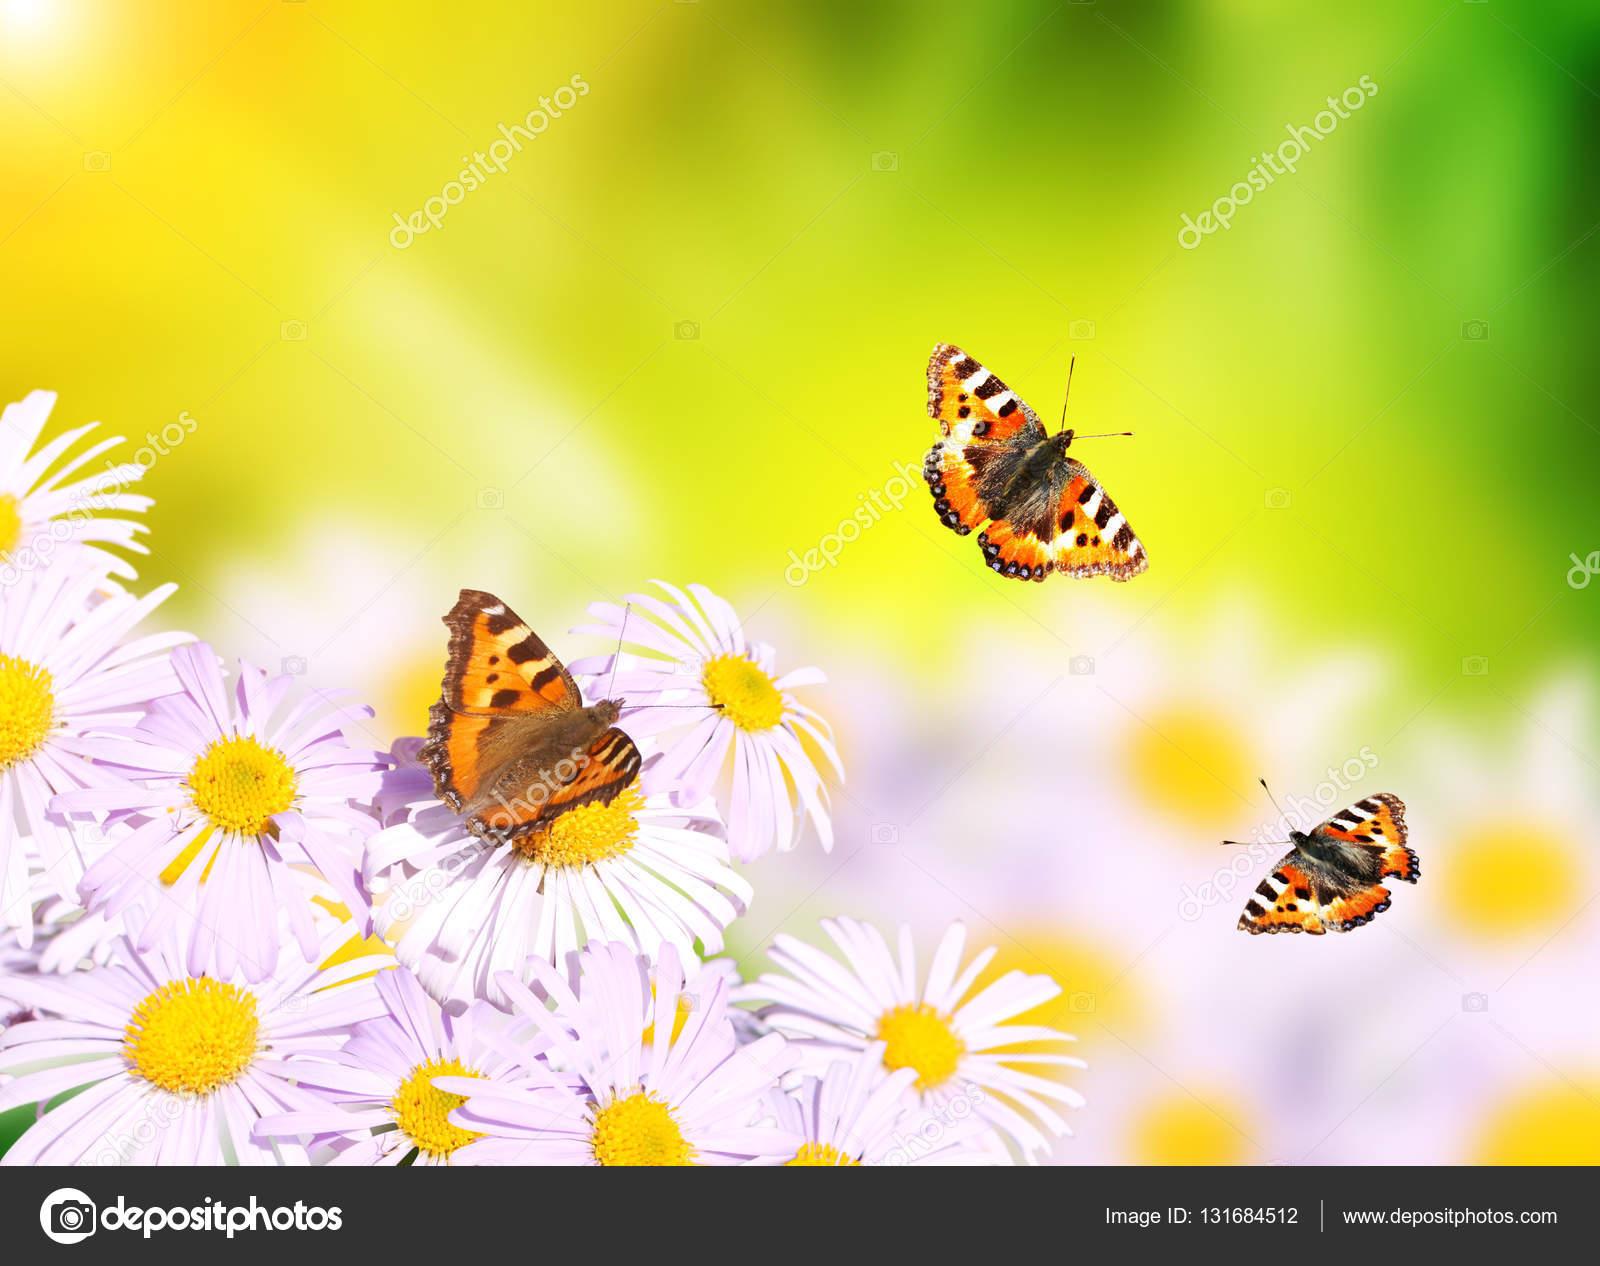 butterflies flying over flowers u2014 stock photo frenta 131684512